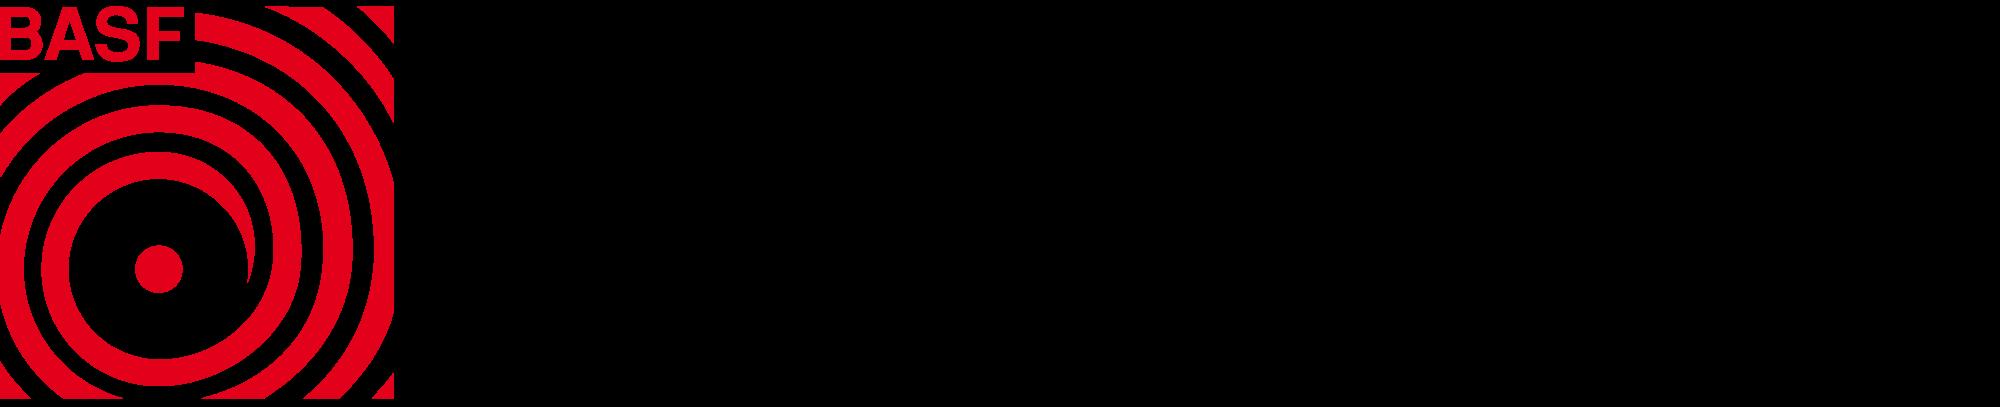 Basf Logos